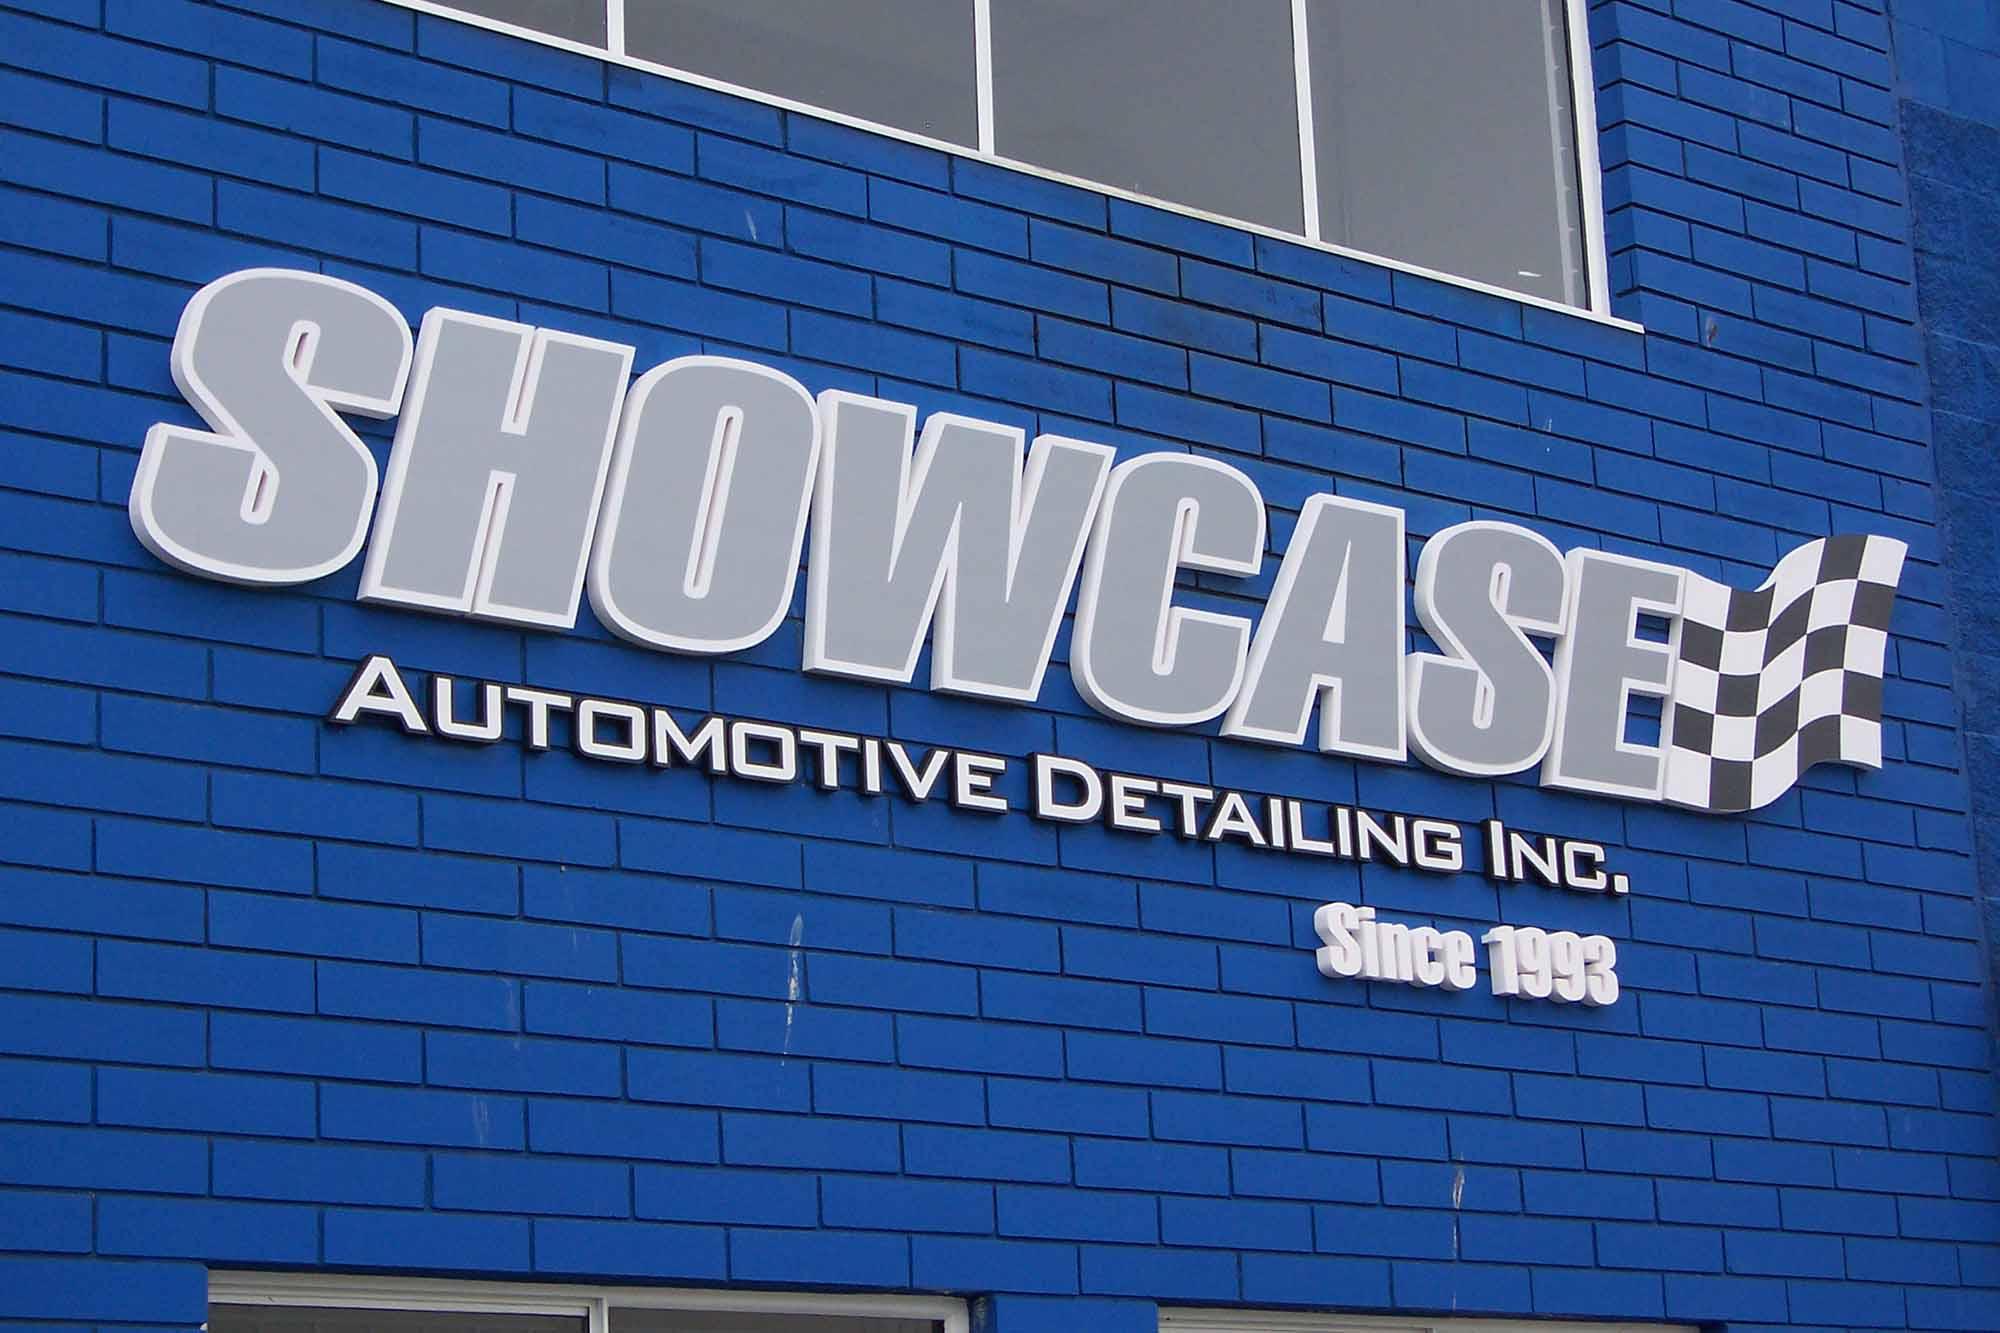 Showcase auto store front on brick